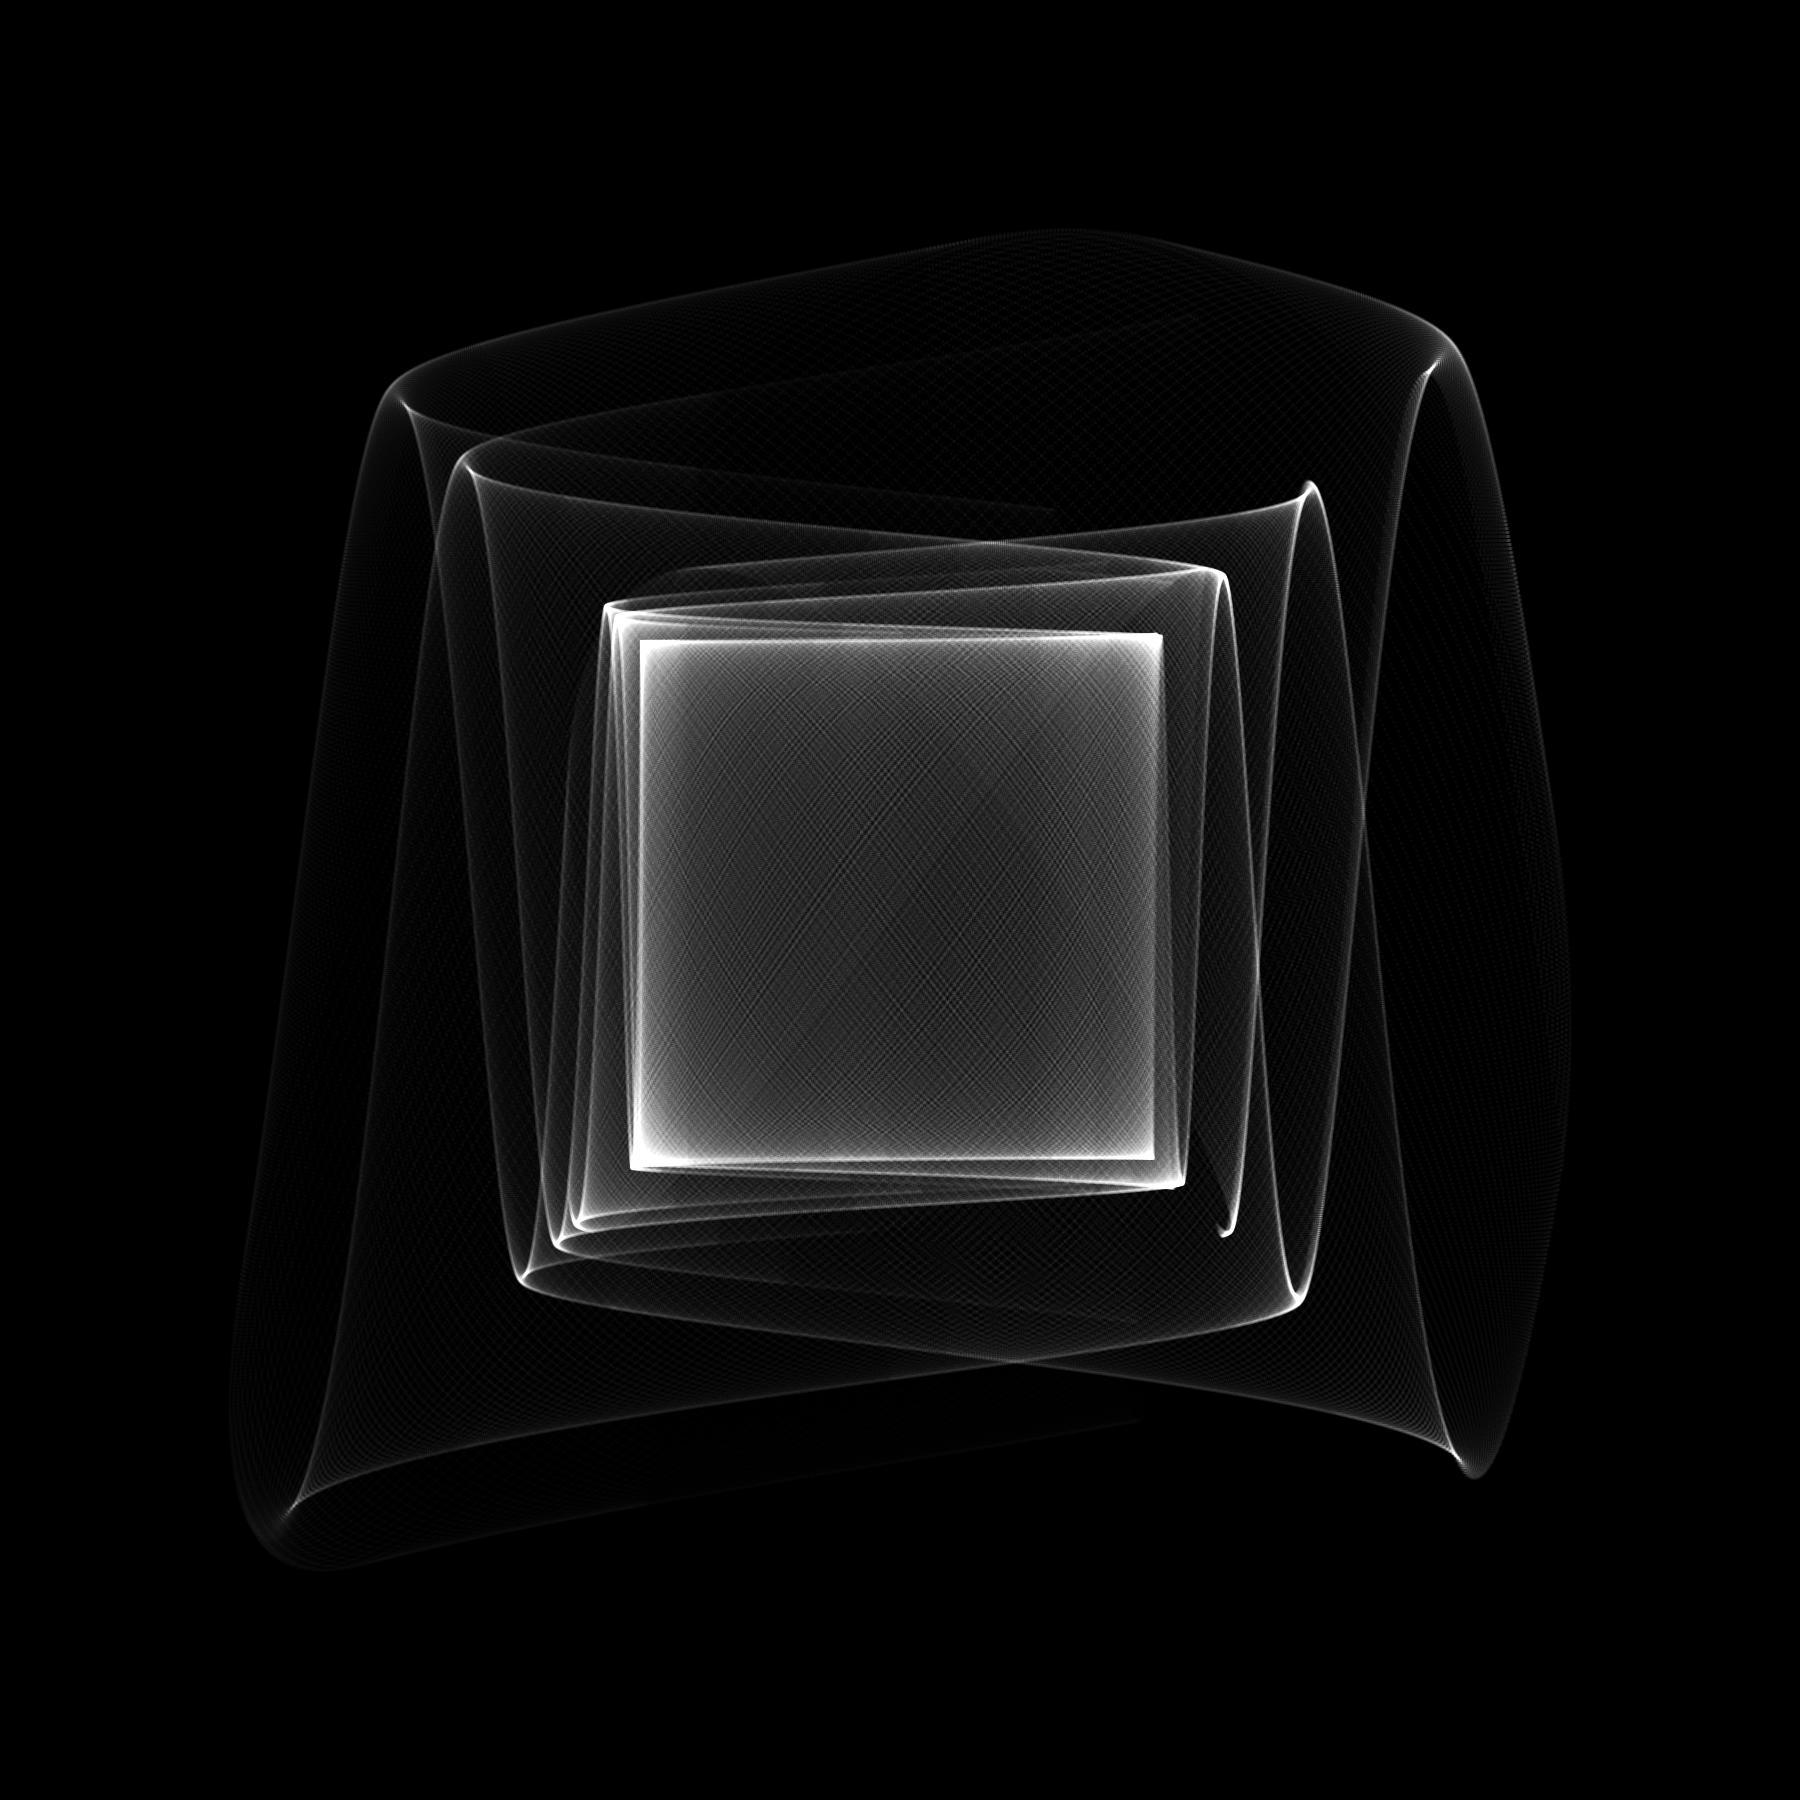 Phase_WebGL_StackGL_RezaAli.png